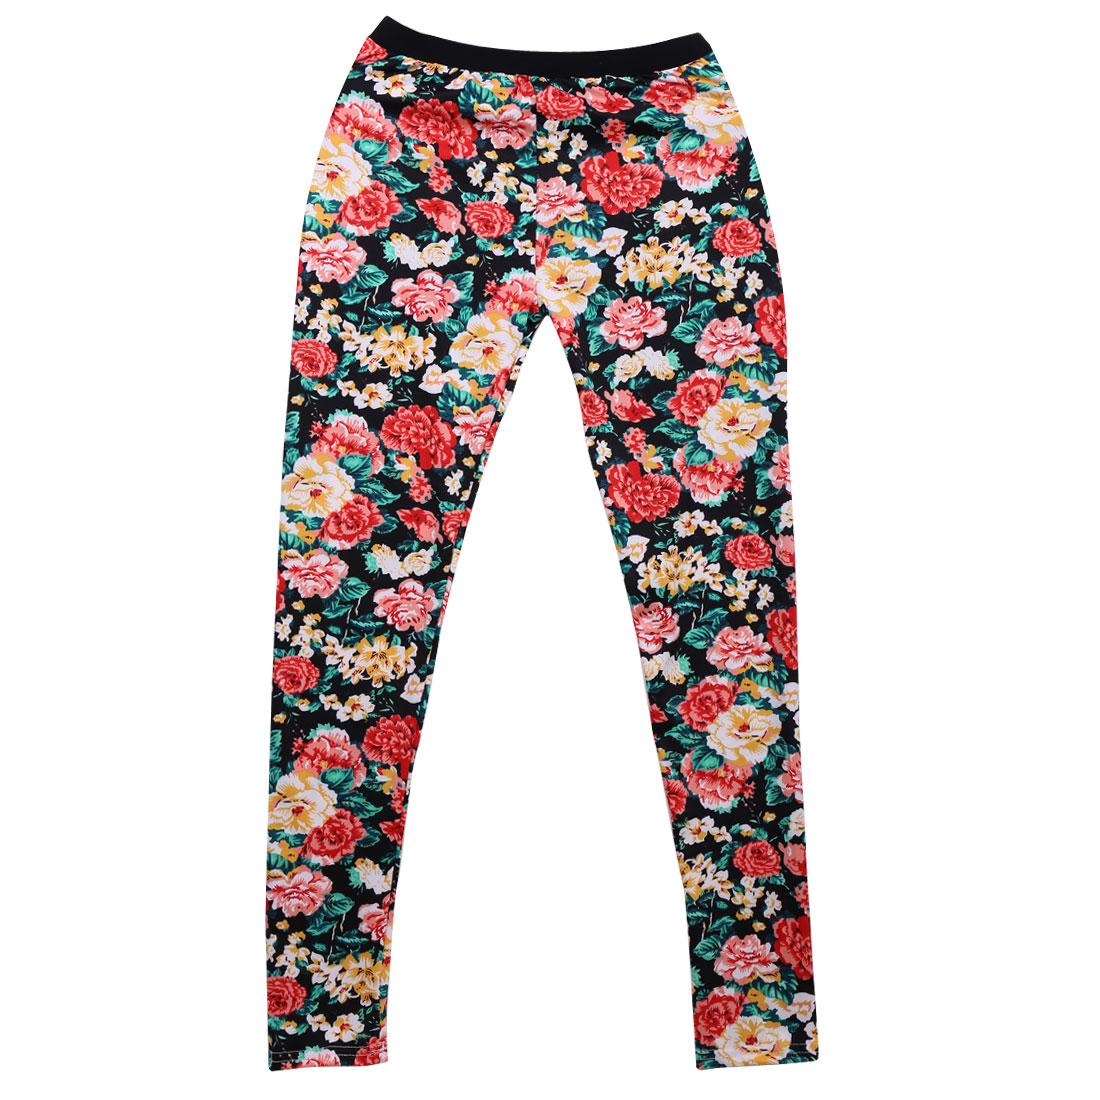 Women Black XS Elastic Waist Style Multicolor Floral Pattern Casual Legging